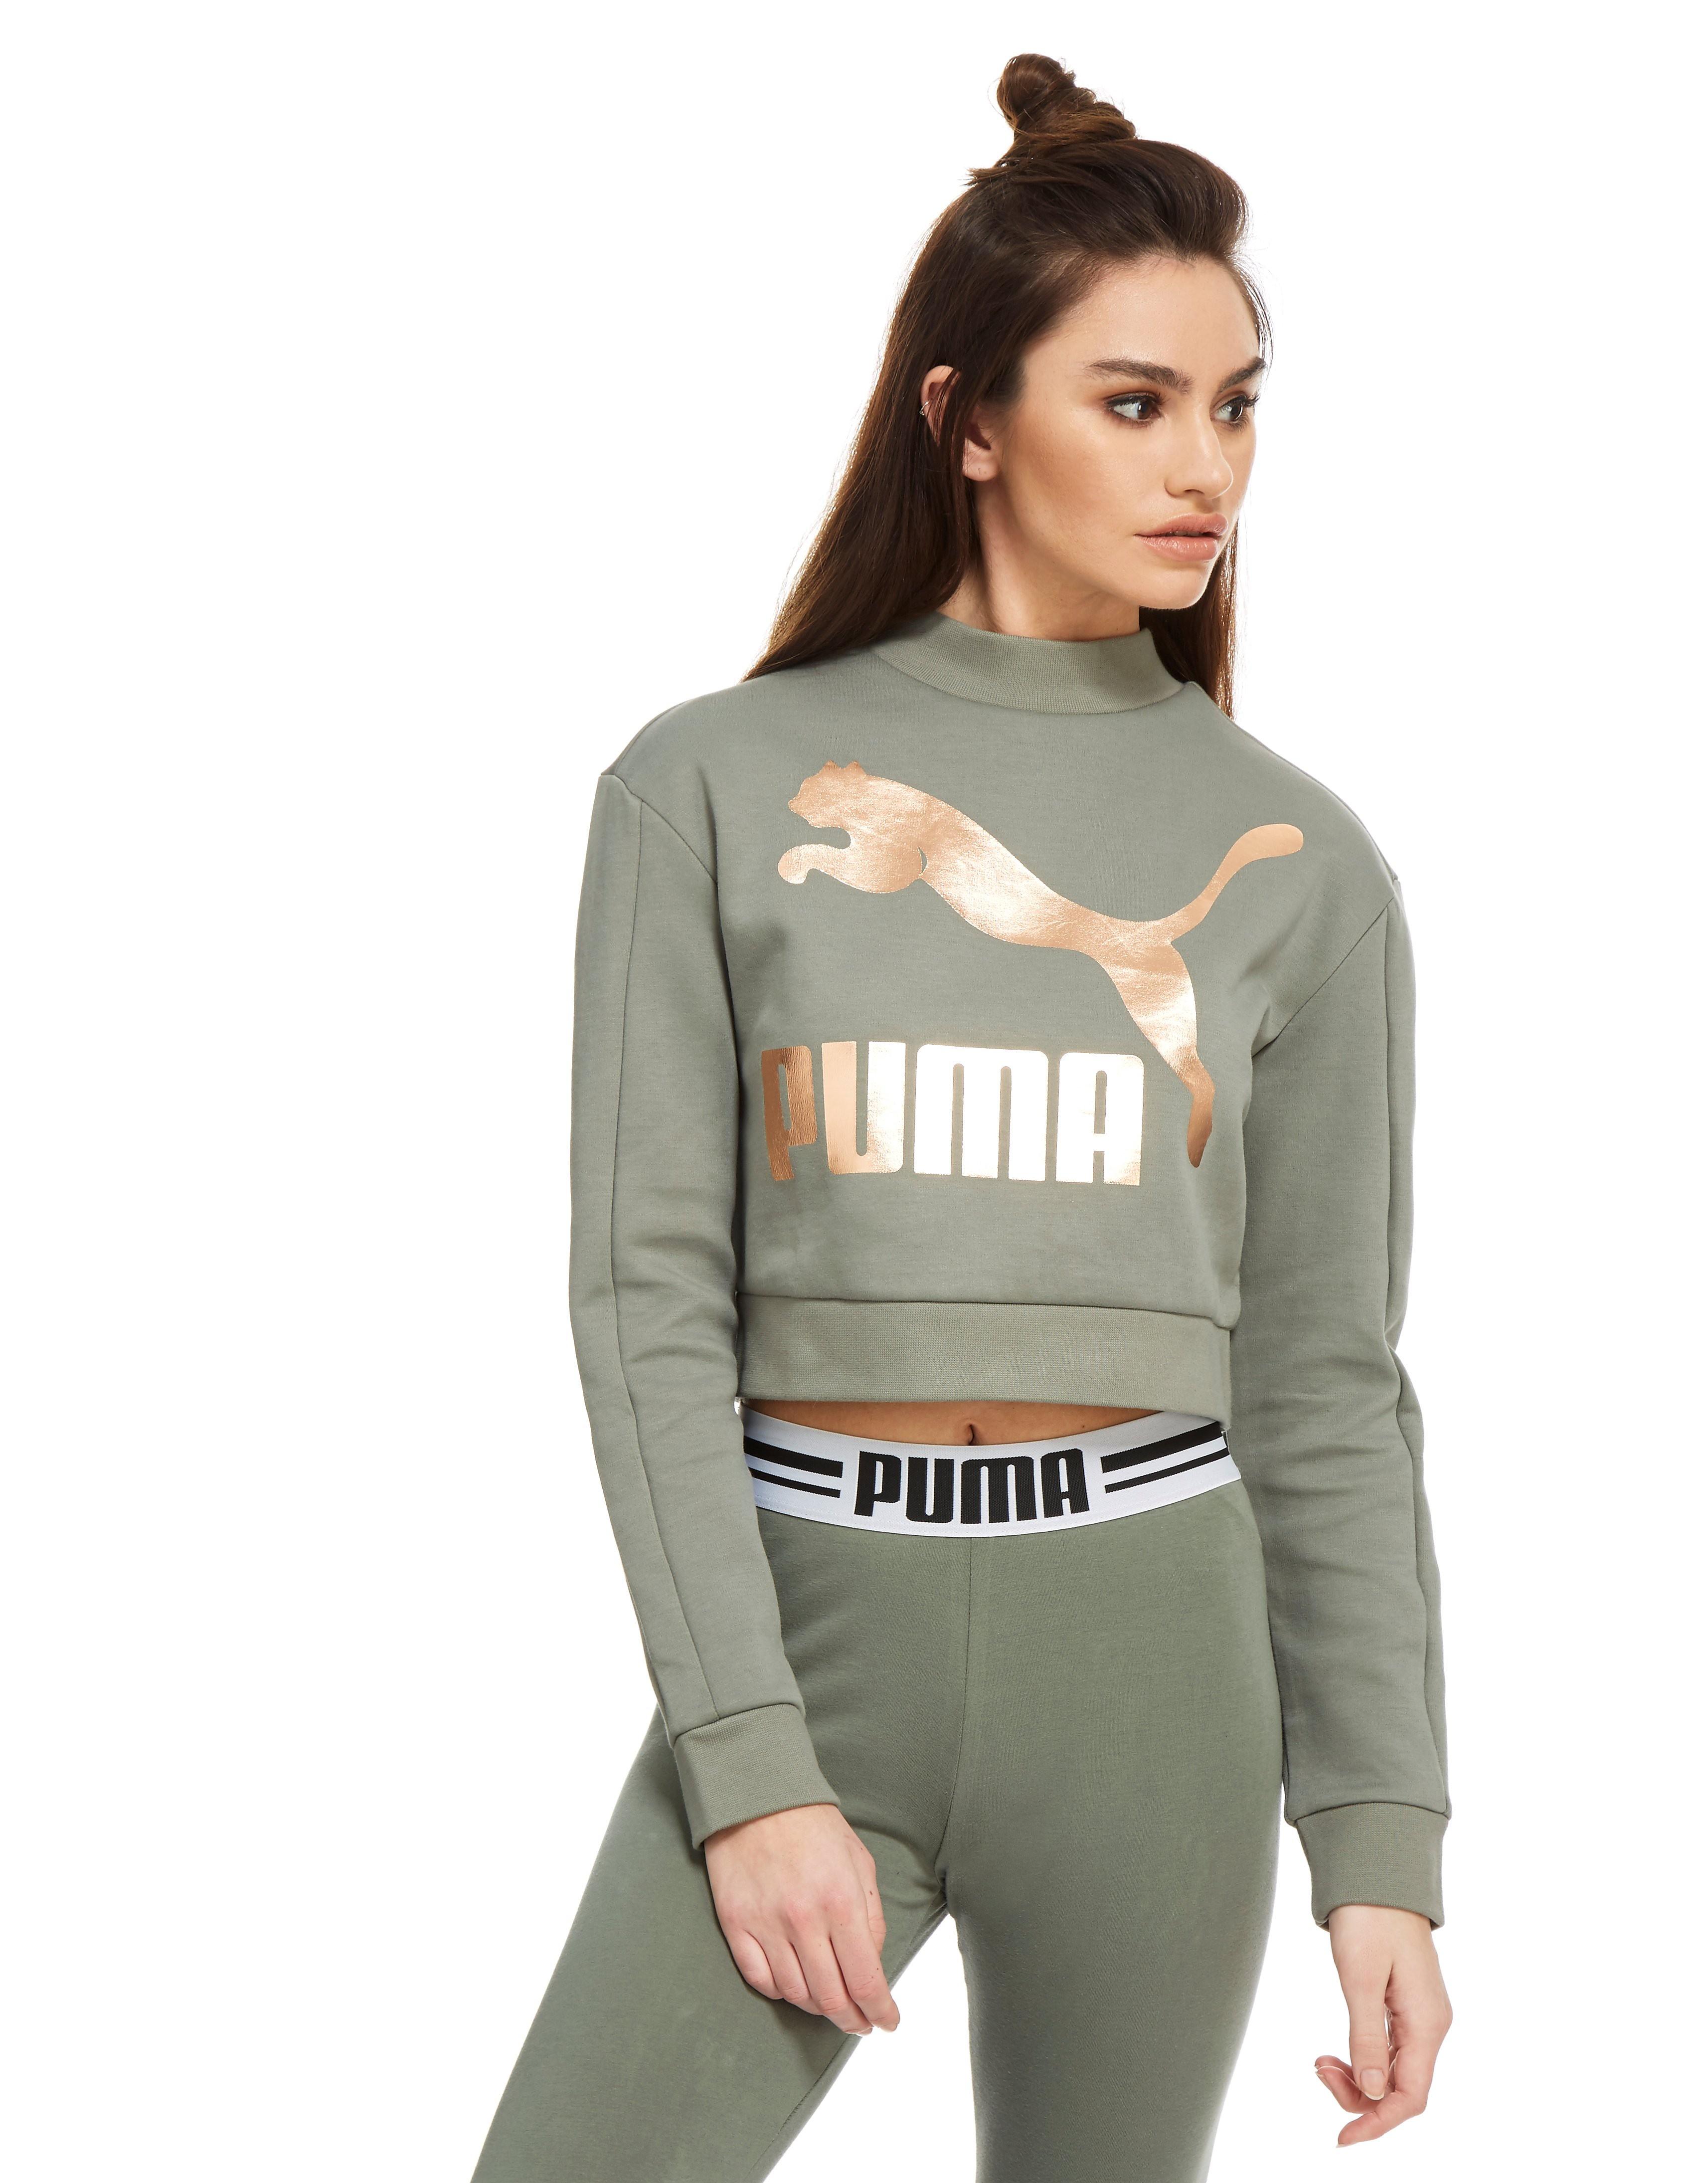 PUMA High Neck Crew Sweatshirt